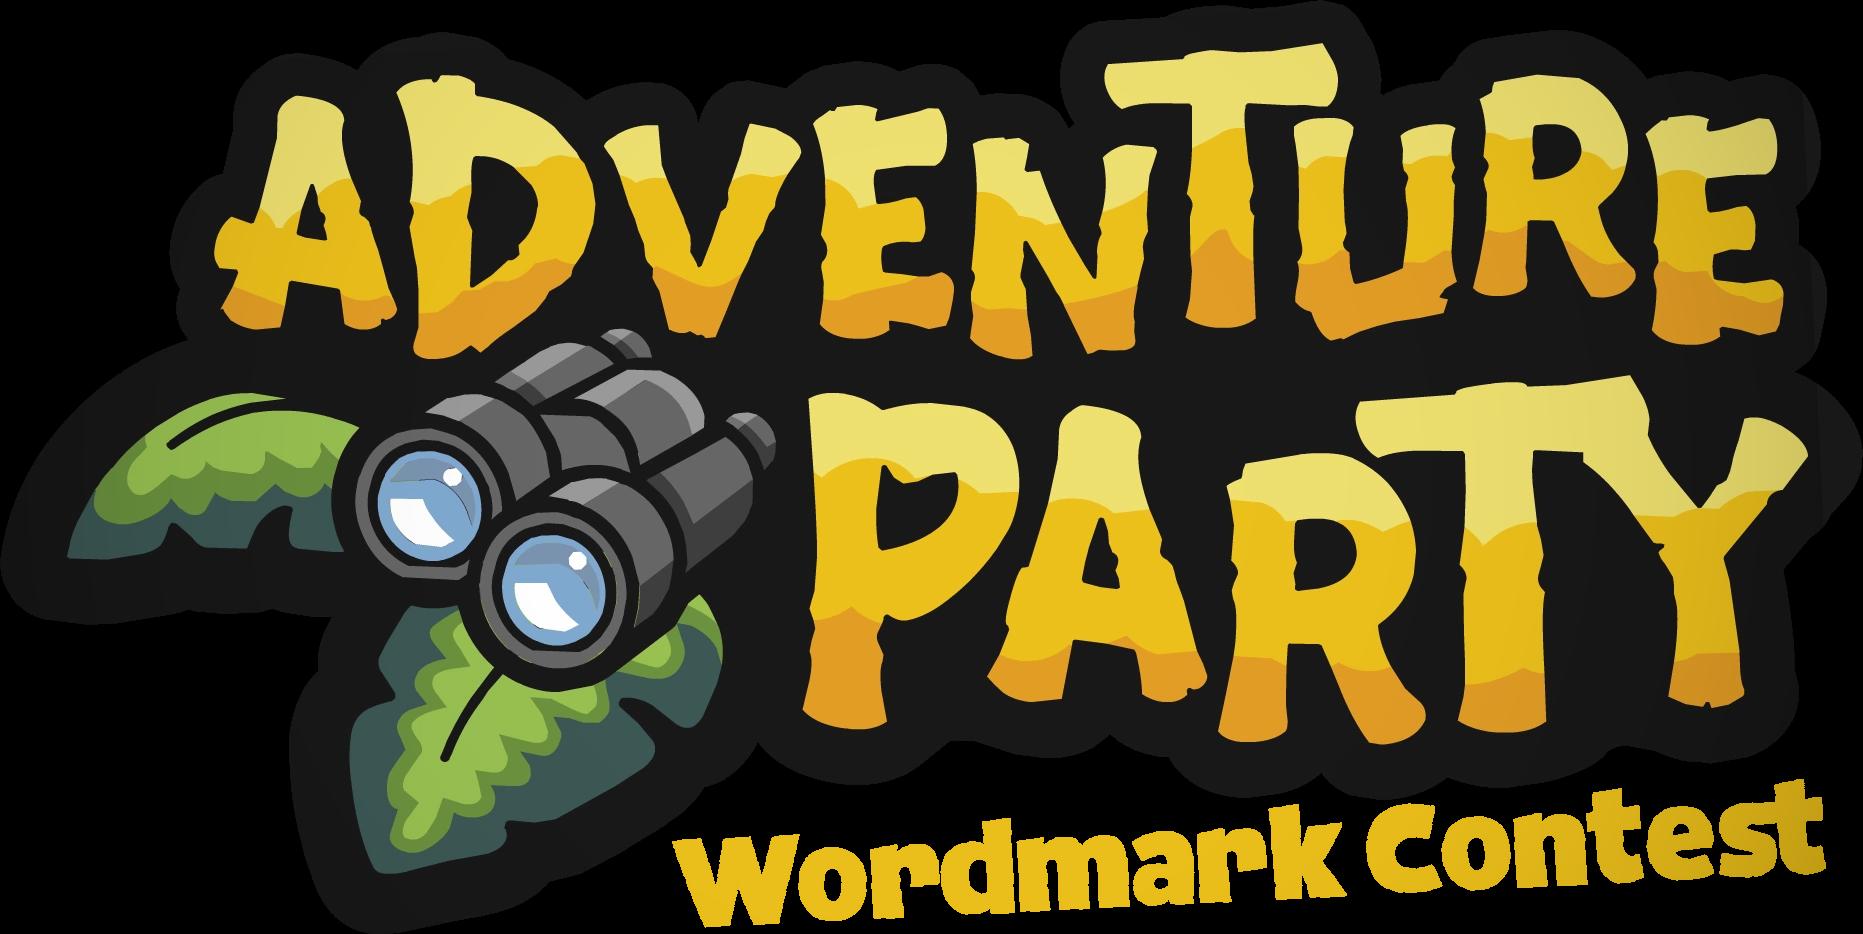 Lataus/Adventure Party Wordmark Contest!